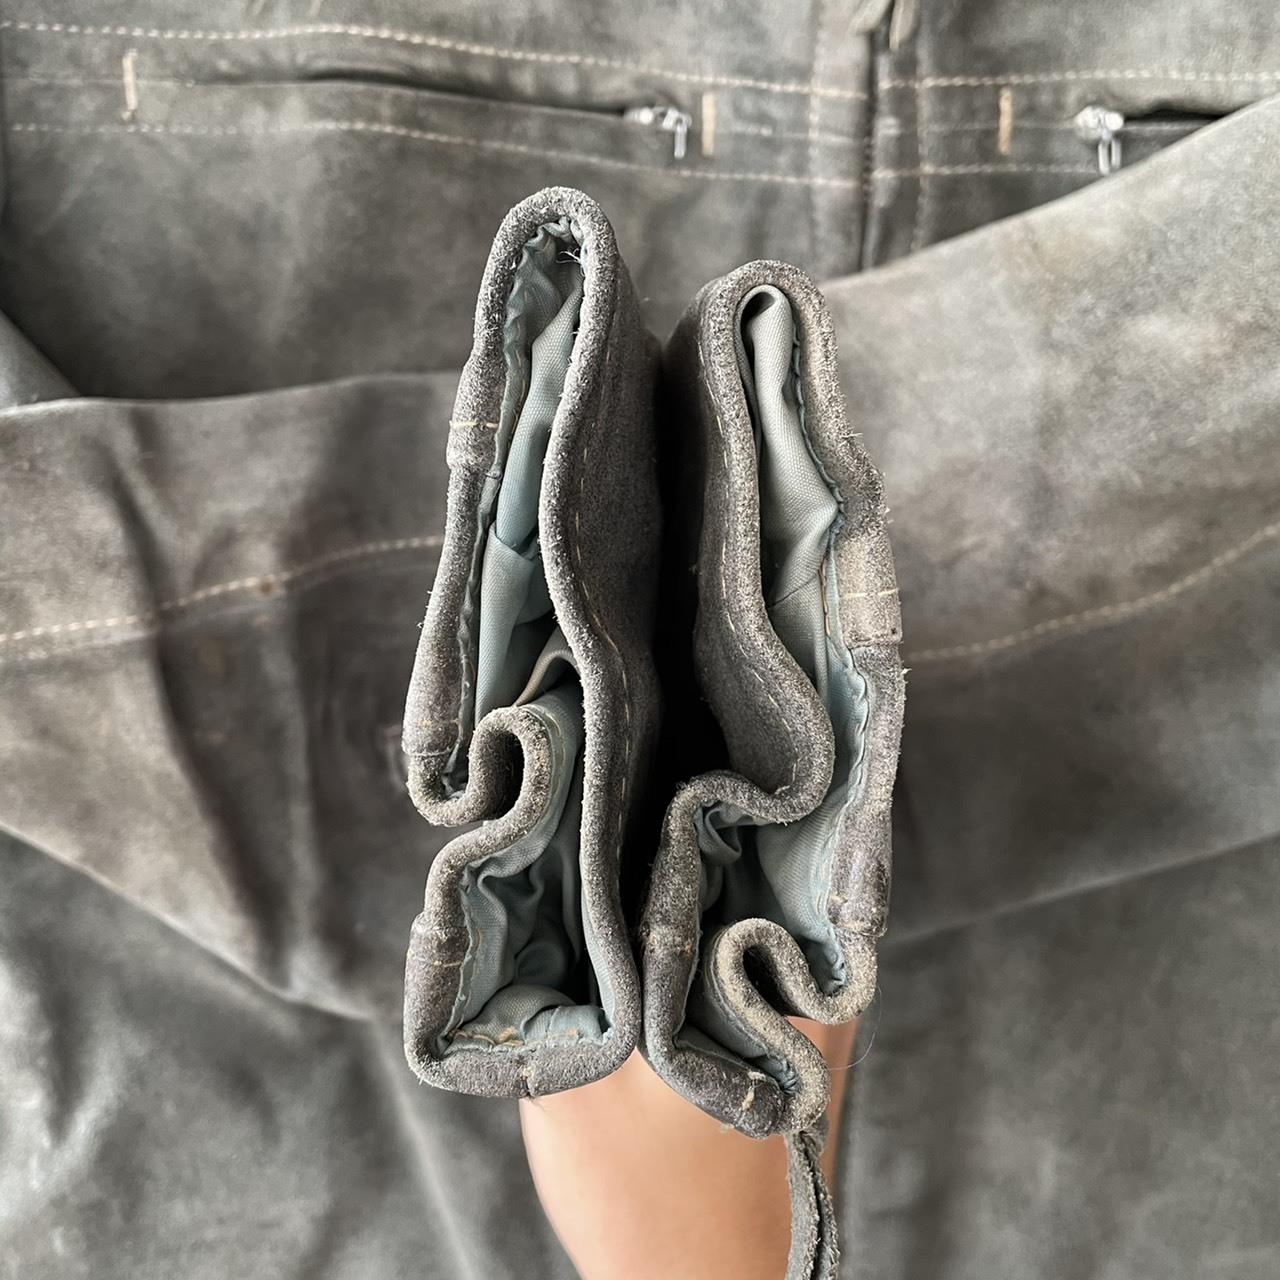 Leather Jacket_c0146178_12375766.jpg